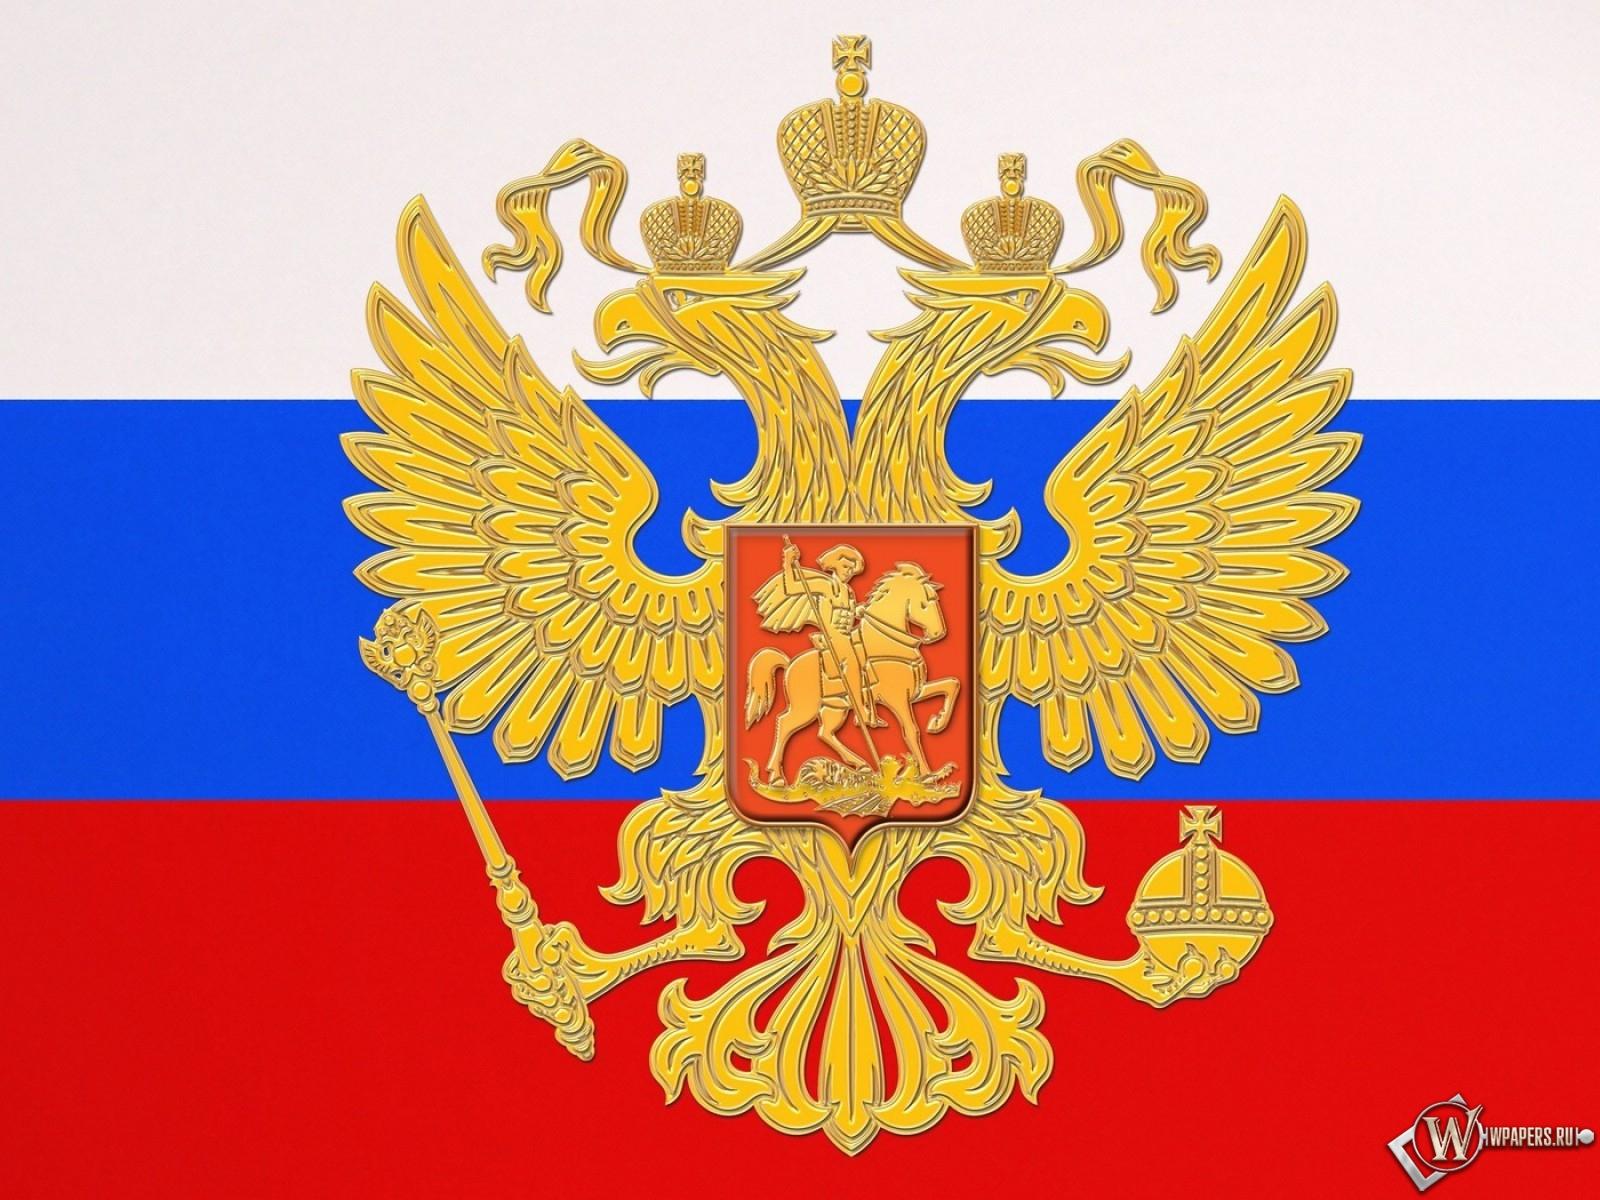 Обои флаг россии россия герб флаг